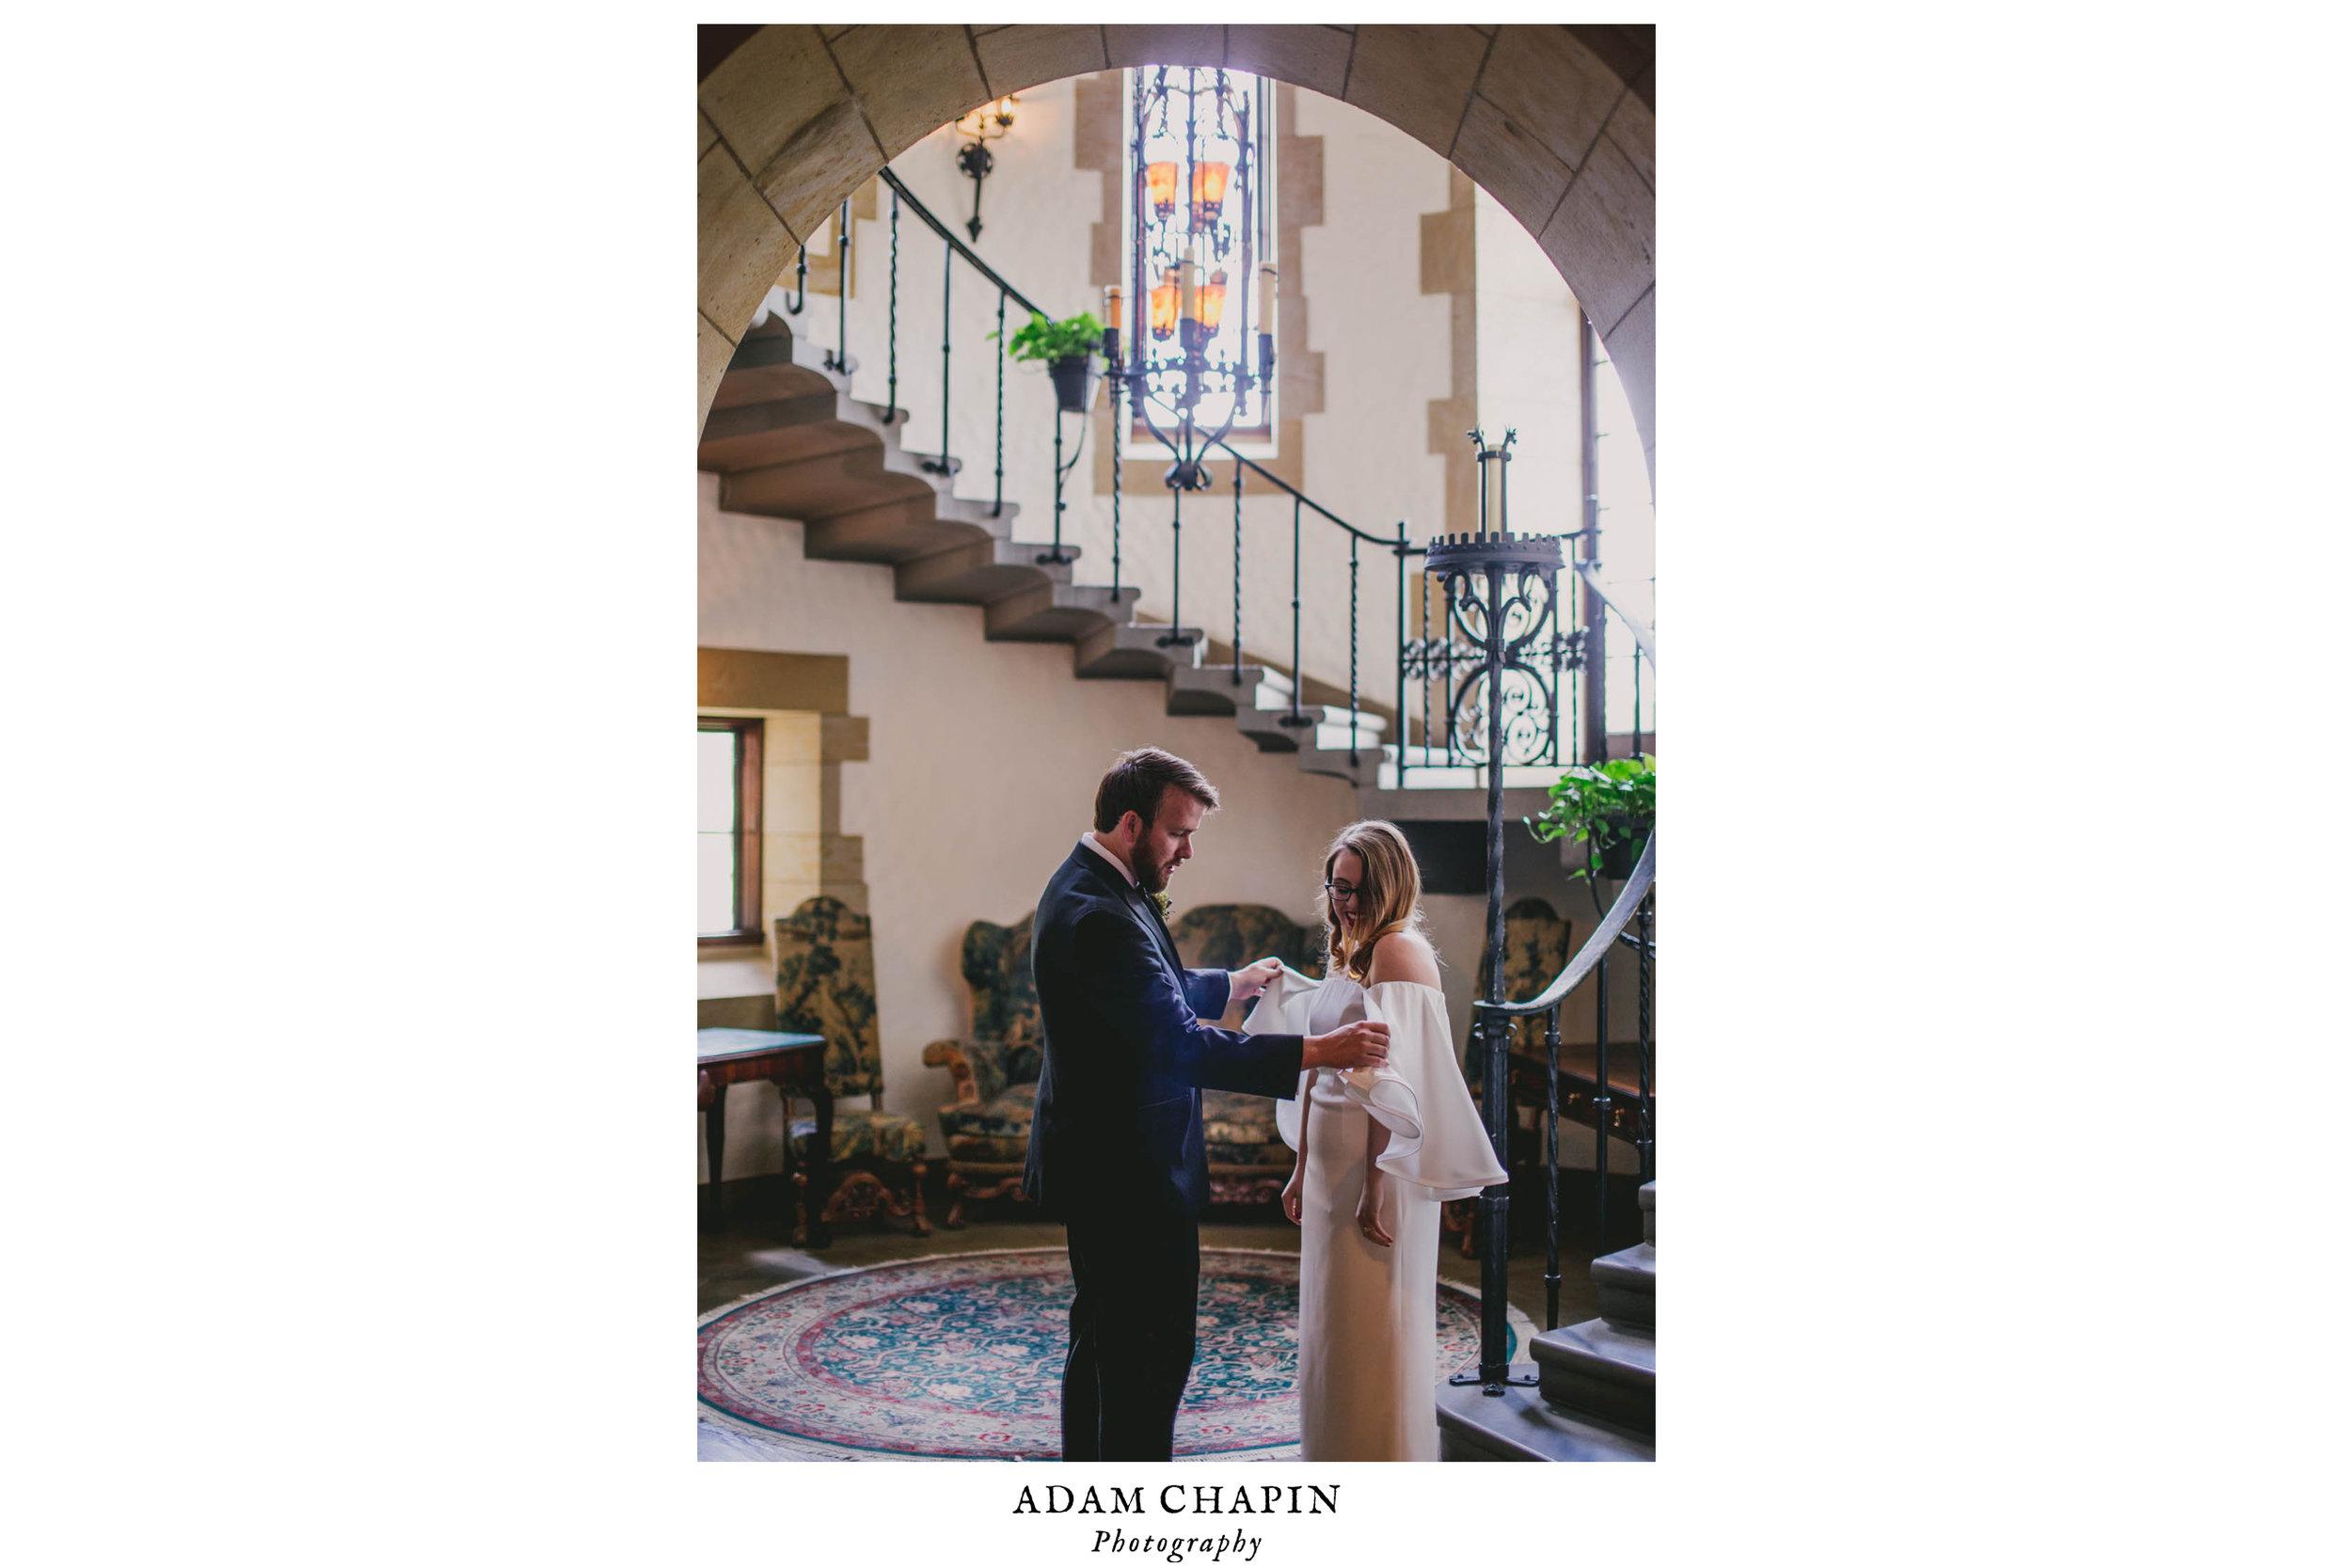 houghton-bride-and-her-groom-wedding-photos.jpg